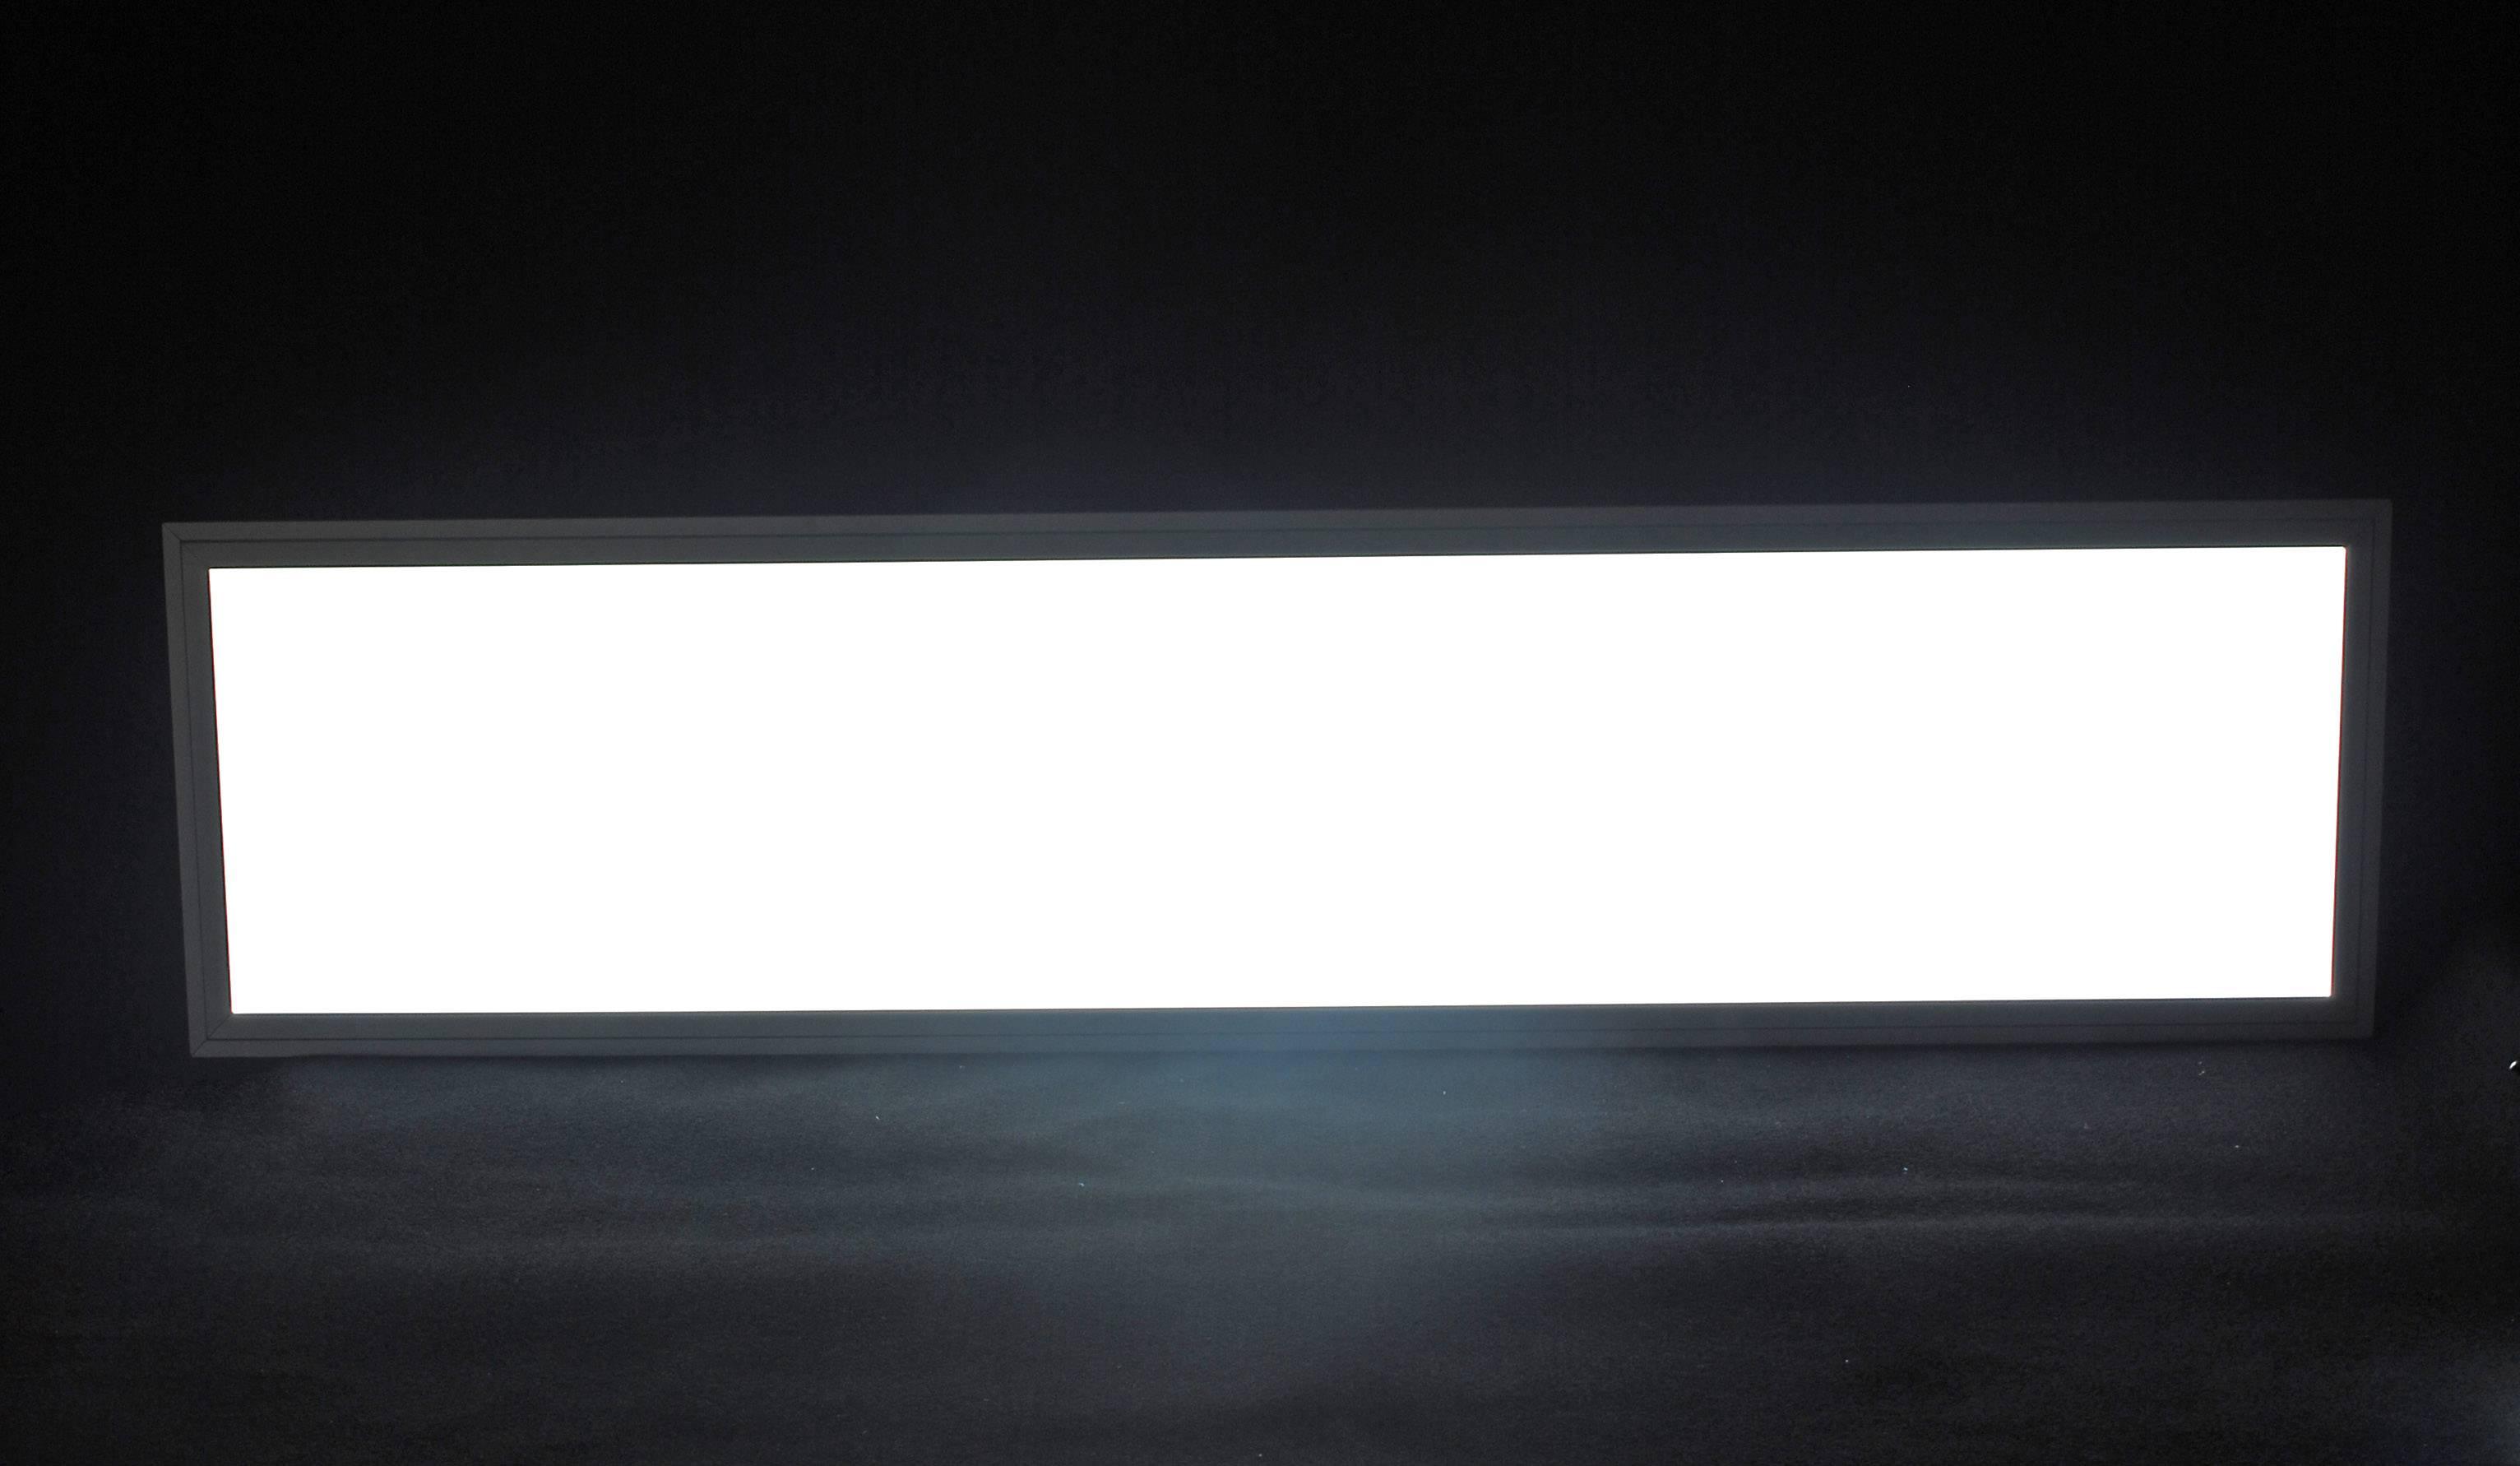 Hot sale 3001200 ecnomic LED panel light